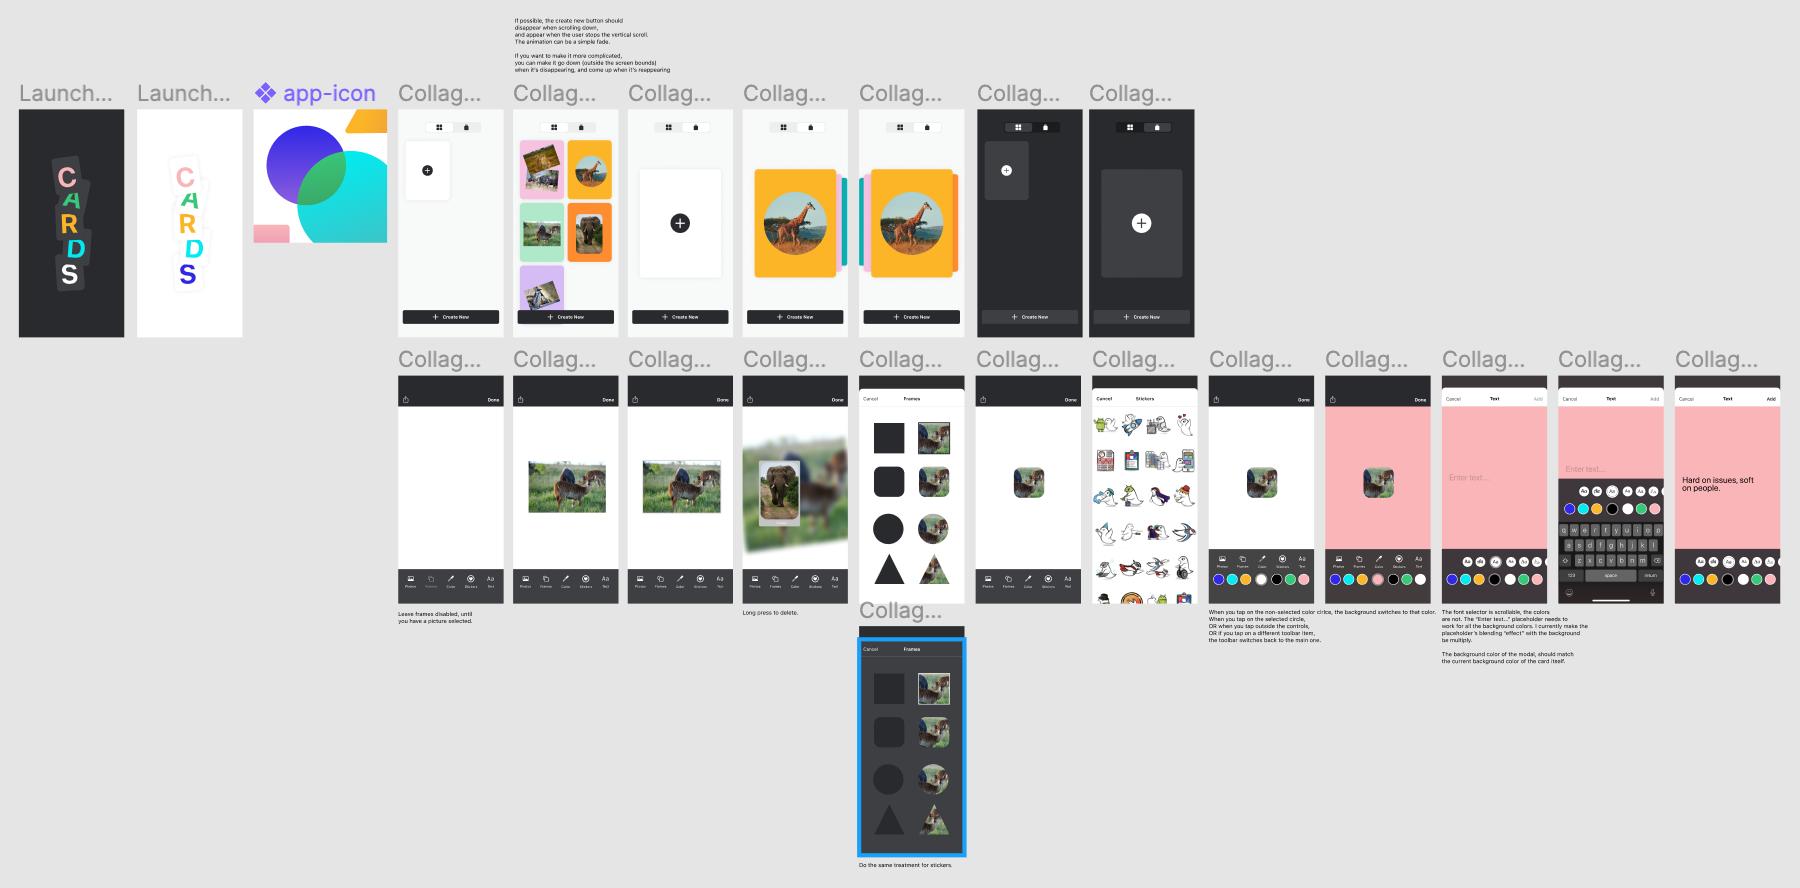 A Figma design file